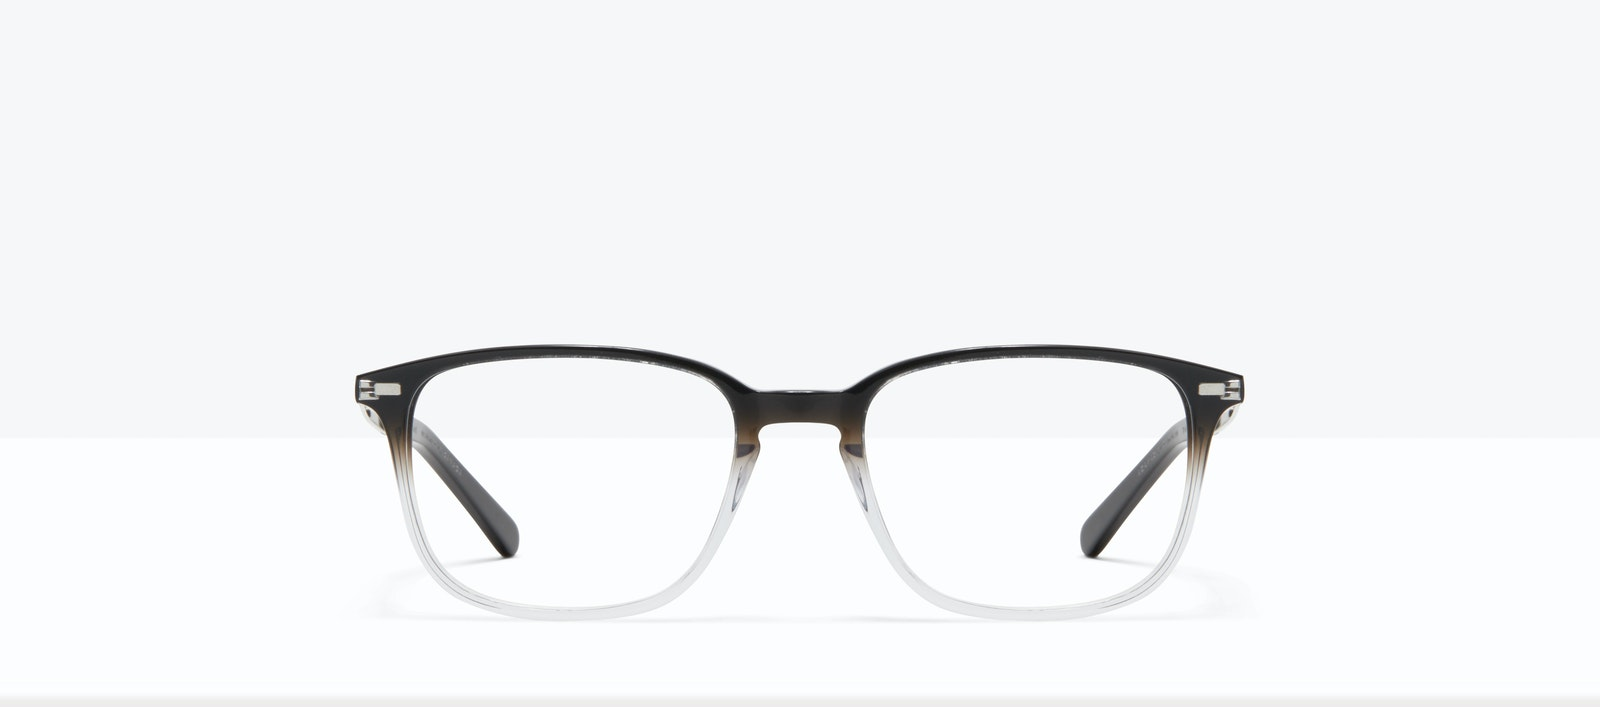 Affordable Fashion Glasses Rectangle Eyeglasses Men Sharp L Onyx Clear Front